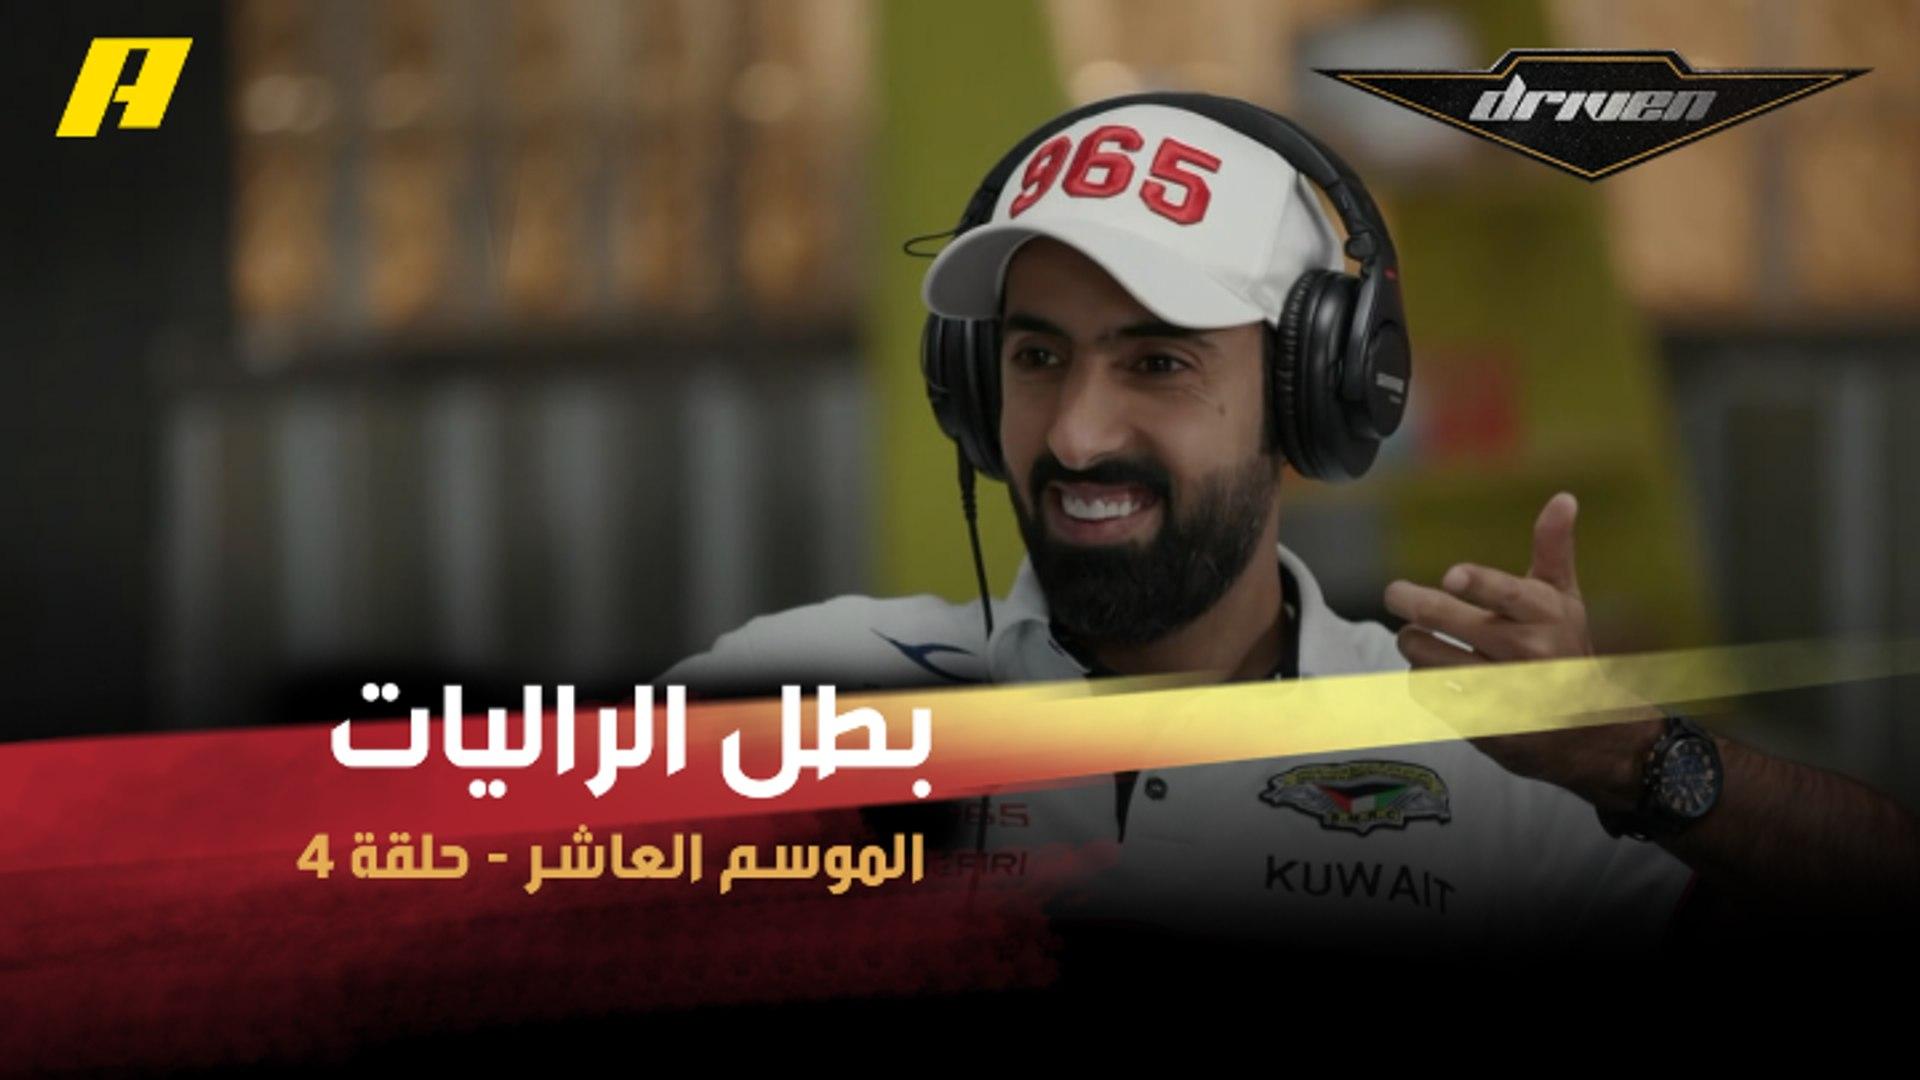 #DrivenMBC - بطل الراليات الكويتي مشاري الظفيري في ستوديو دريفن.. لقاء كوميدي بامتياز